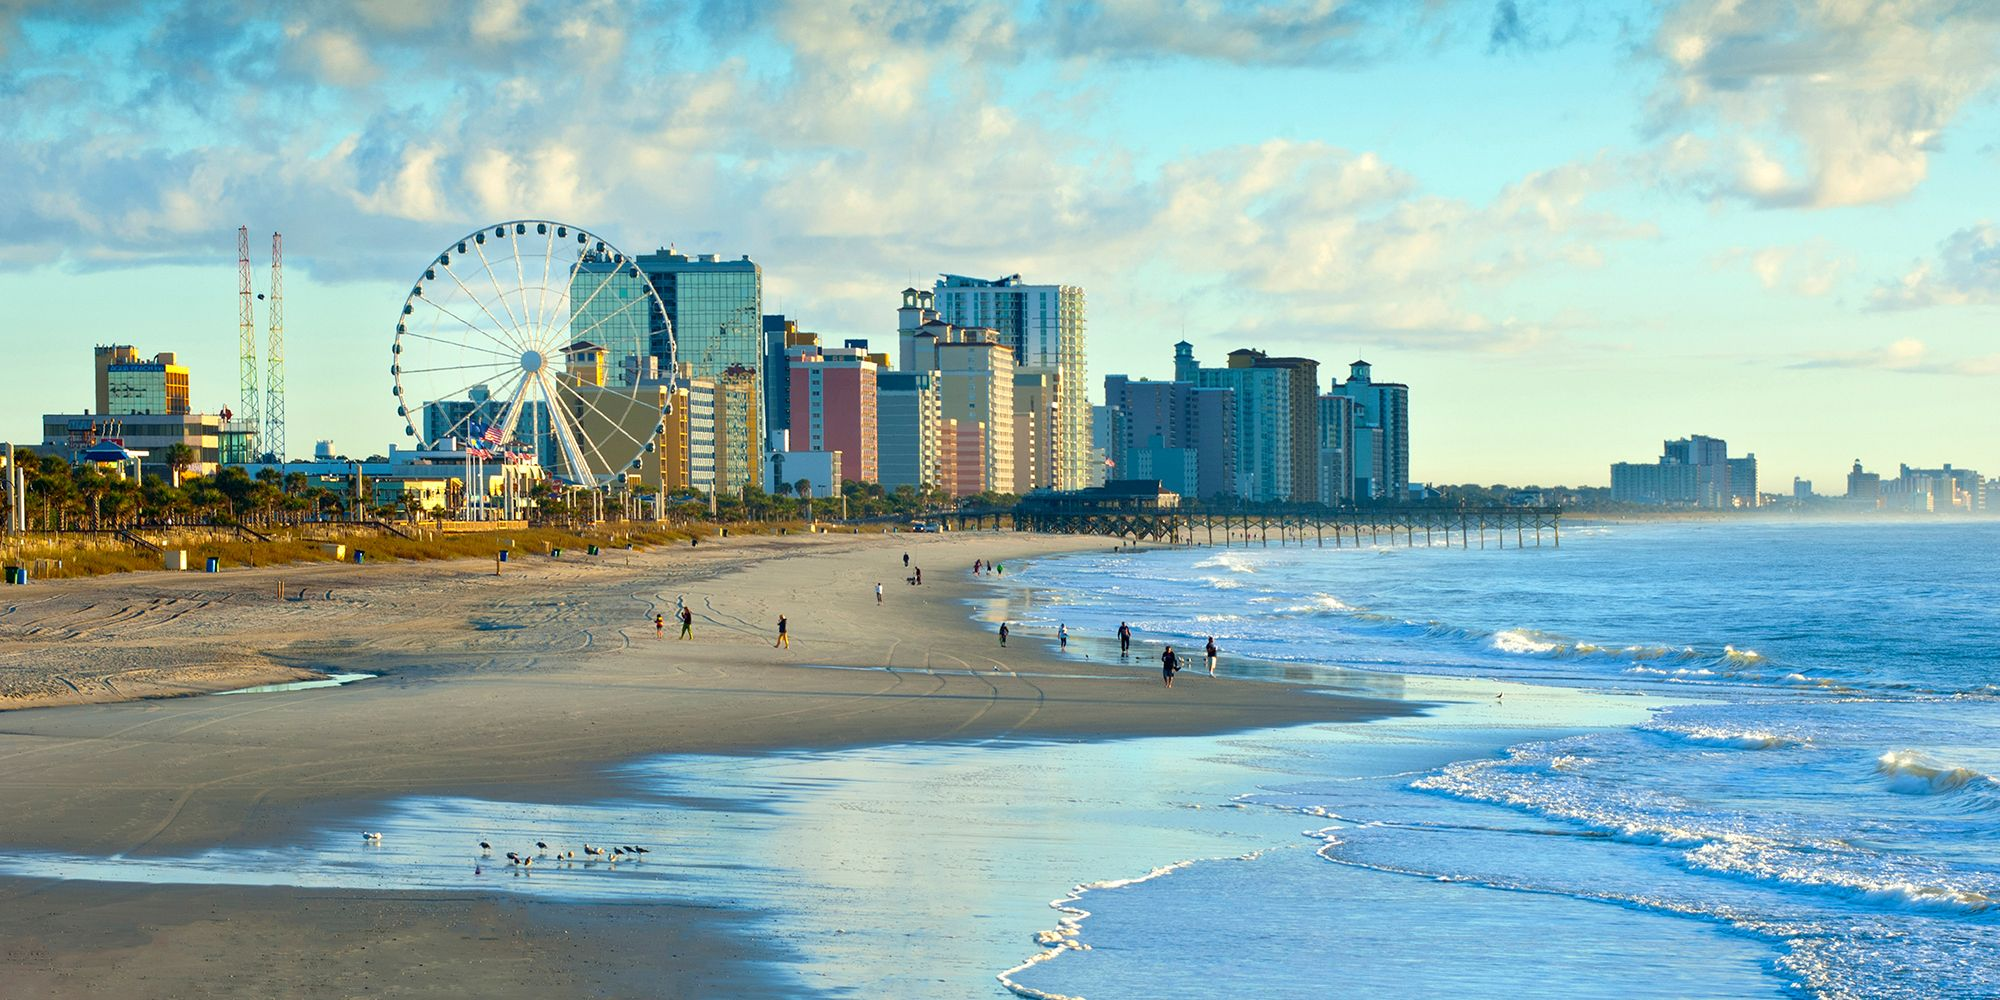 Myrtle Beach — Myrtle Beach, South Carolina